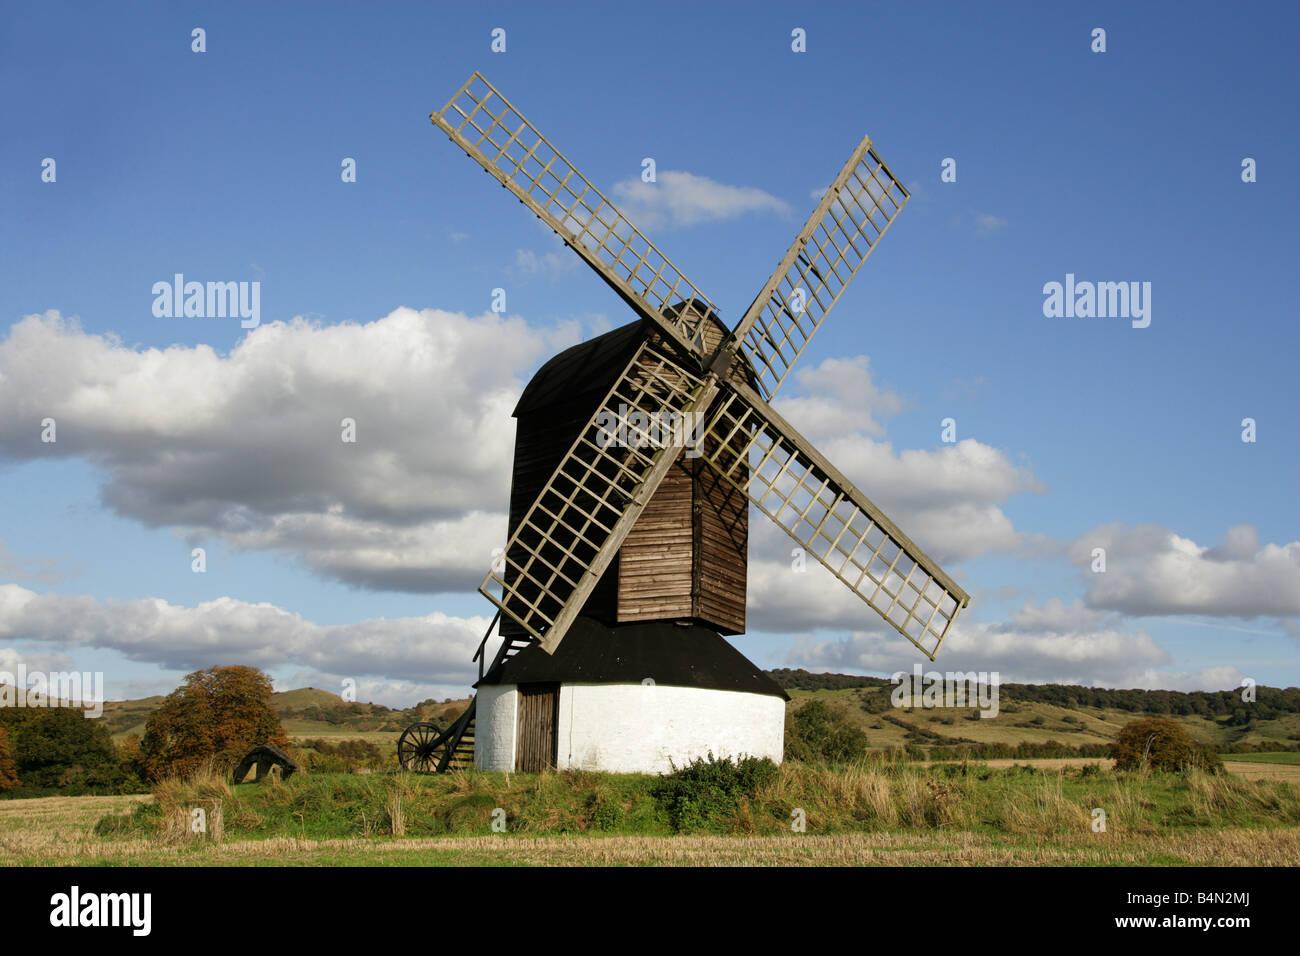 Pitstone Windmill, Pitstone Near Ivinghoe, Buckinghamshire, UK - Stock Image